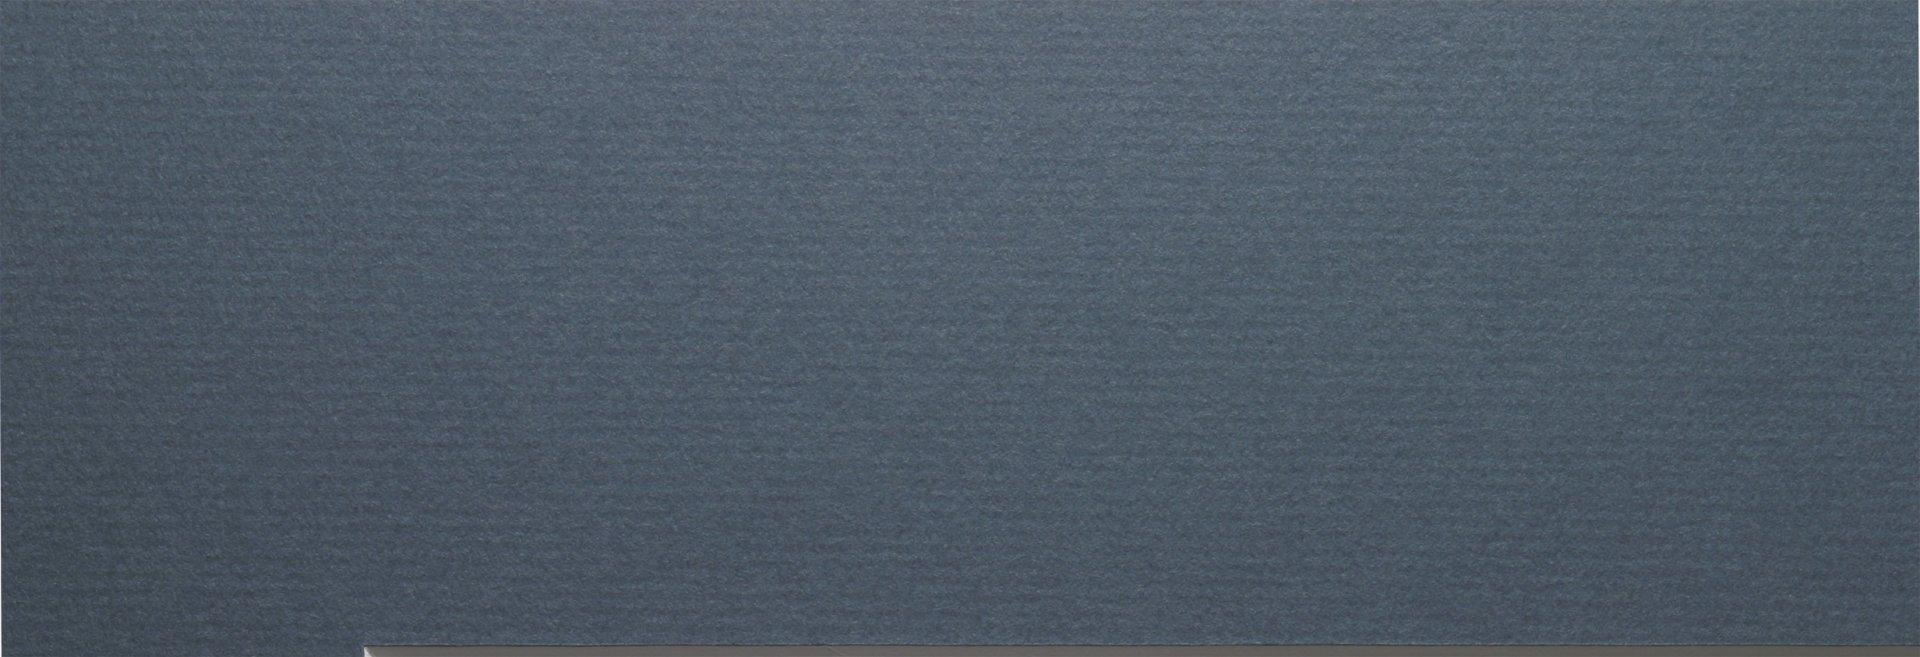 GSRM 1054 Baltic Blue